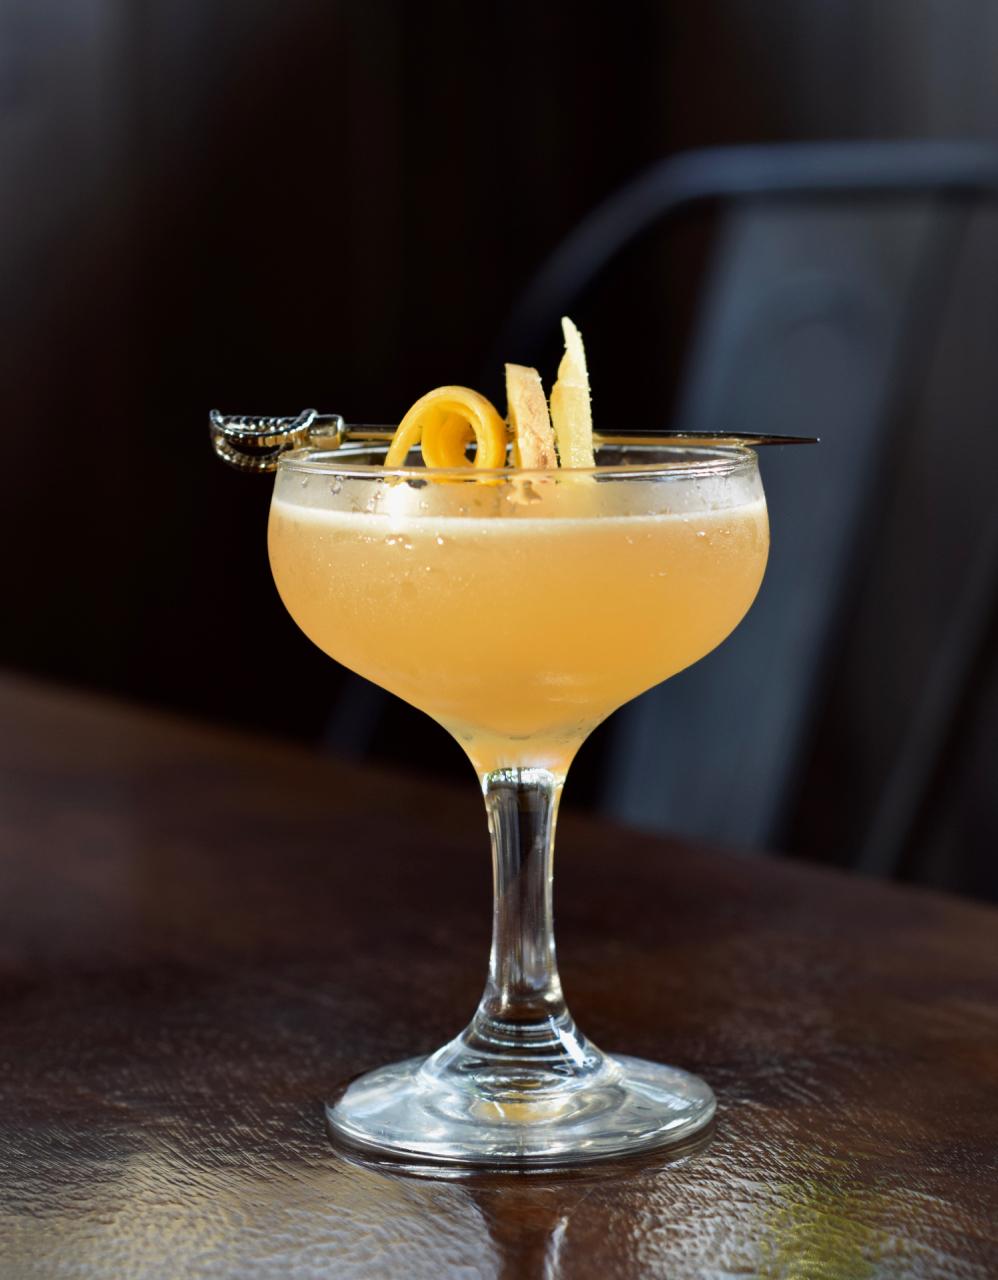 JOHN COMPANY - 2 oz blended scotch1/2 oz nostrum pineapple turmeric ginger shrub3/4 oz fresh lemon juice1/4 oz honey syrup2 dashes angostura bittersShake with ice and strain.